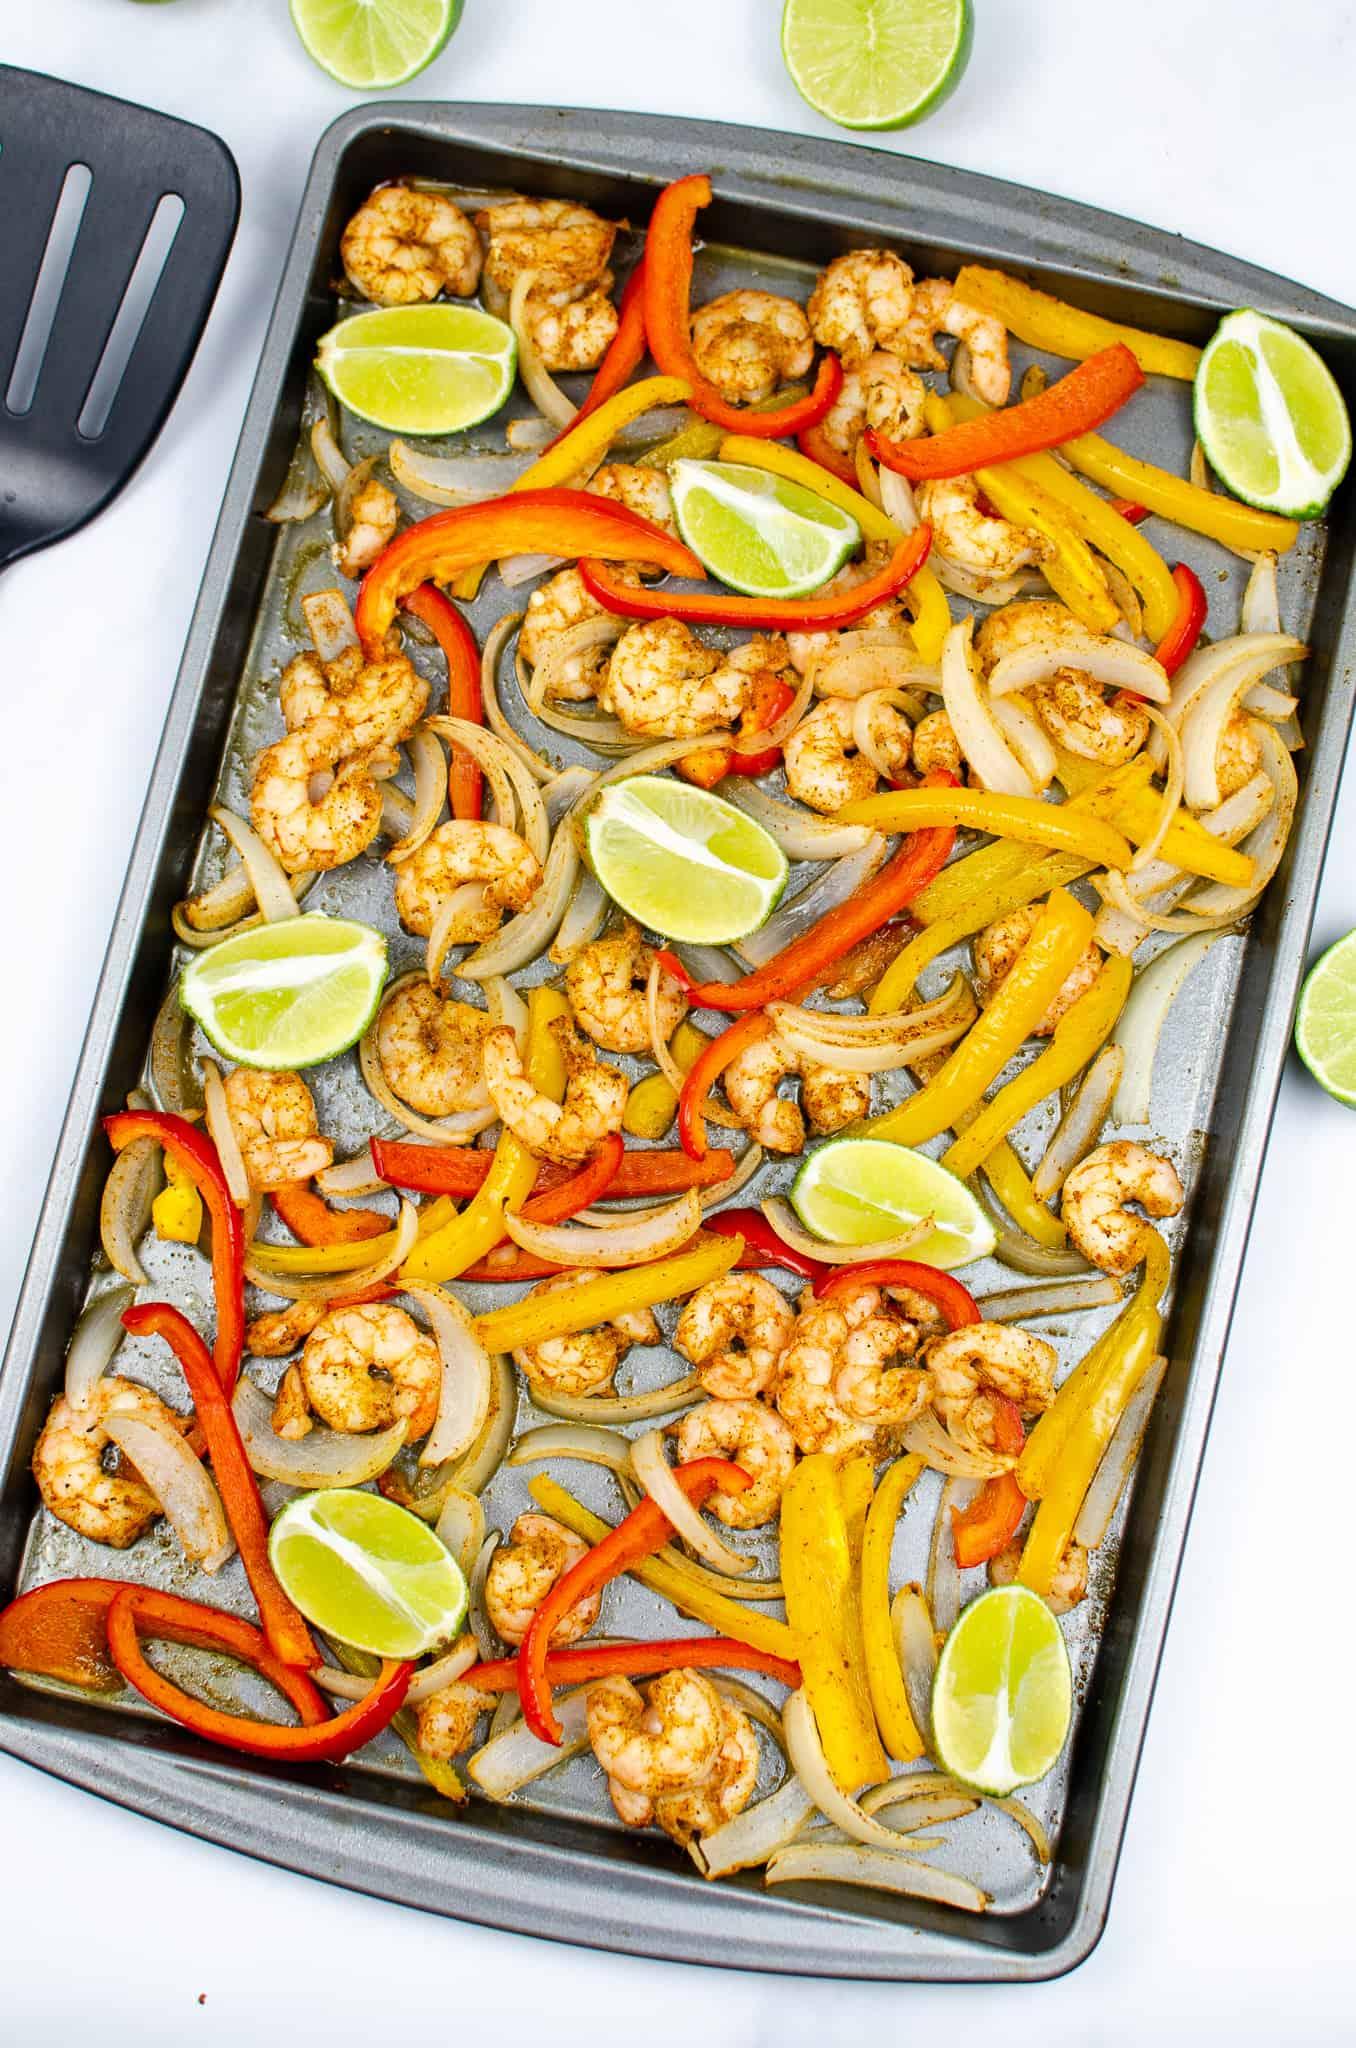 Sheet pan on oven of Sheet Pan Shrimp Fajitas